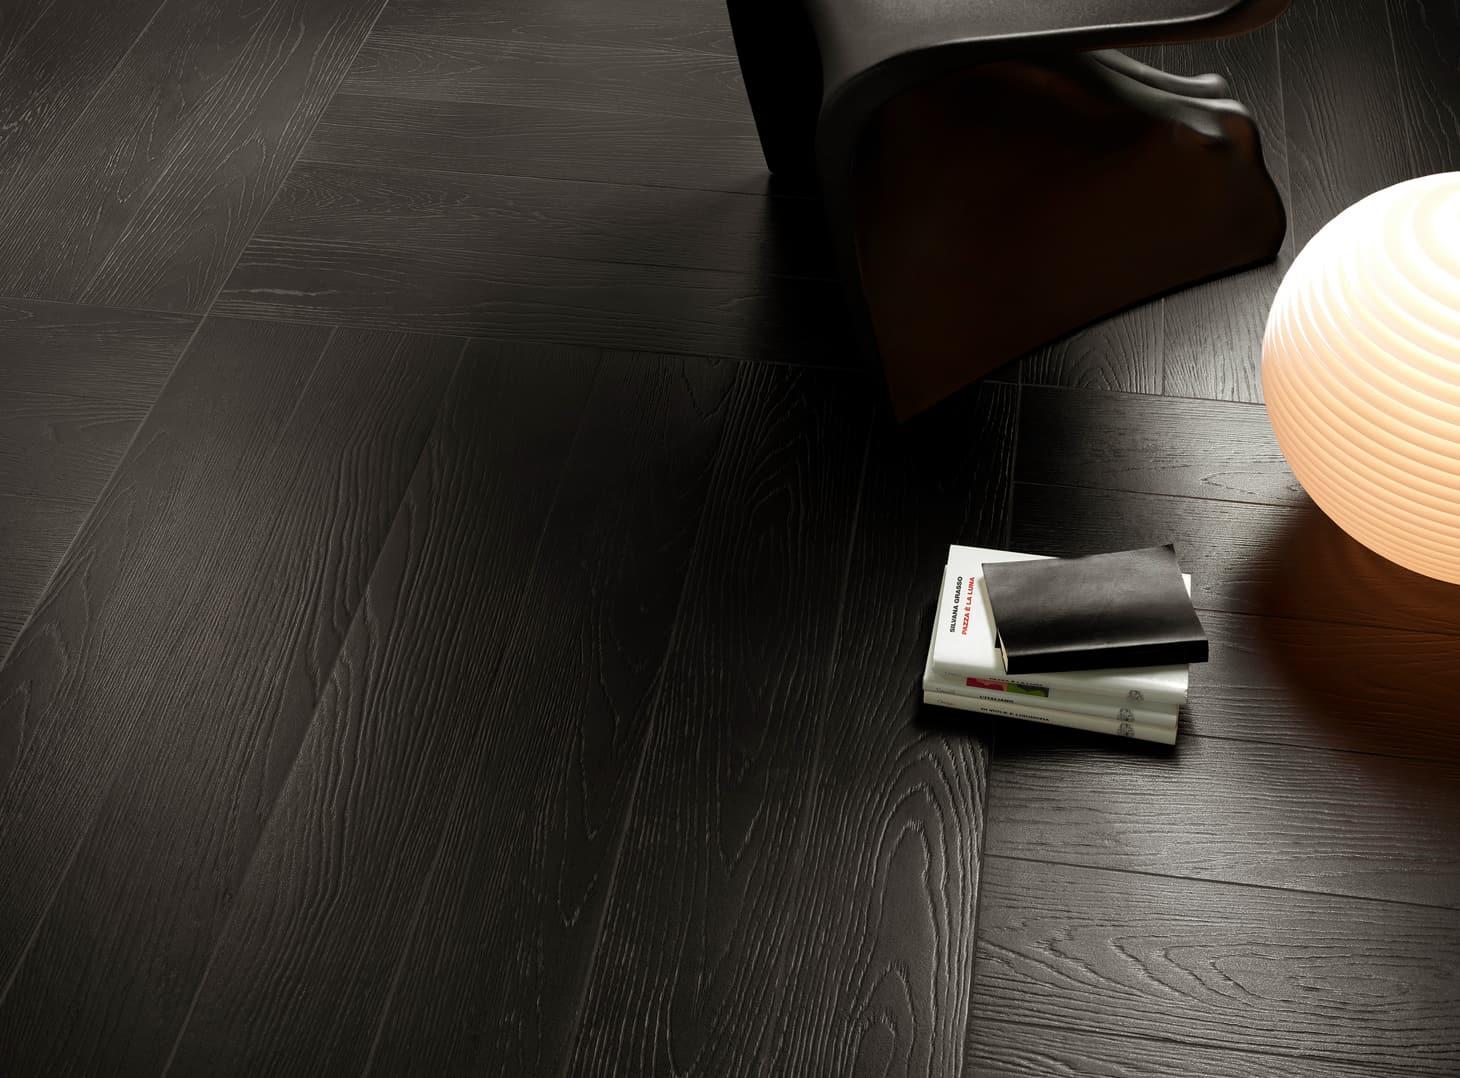 Wood Effect Tiles Decoration 1. Black Wood Floor Tiles